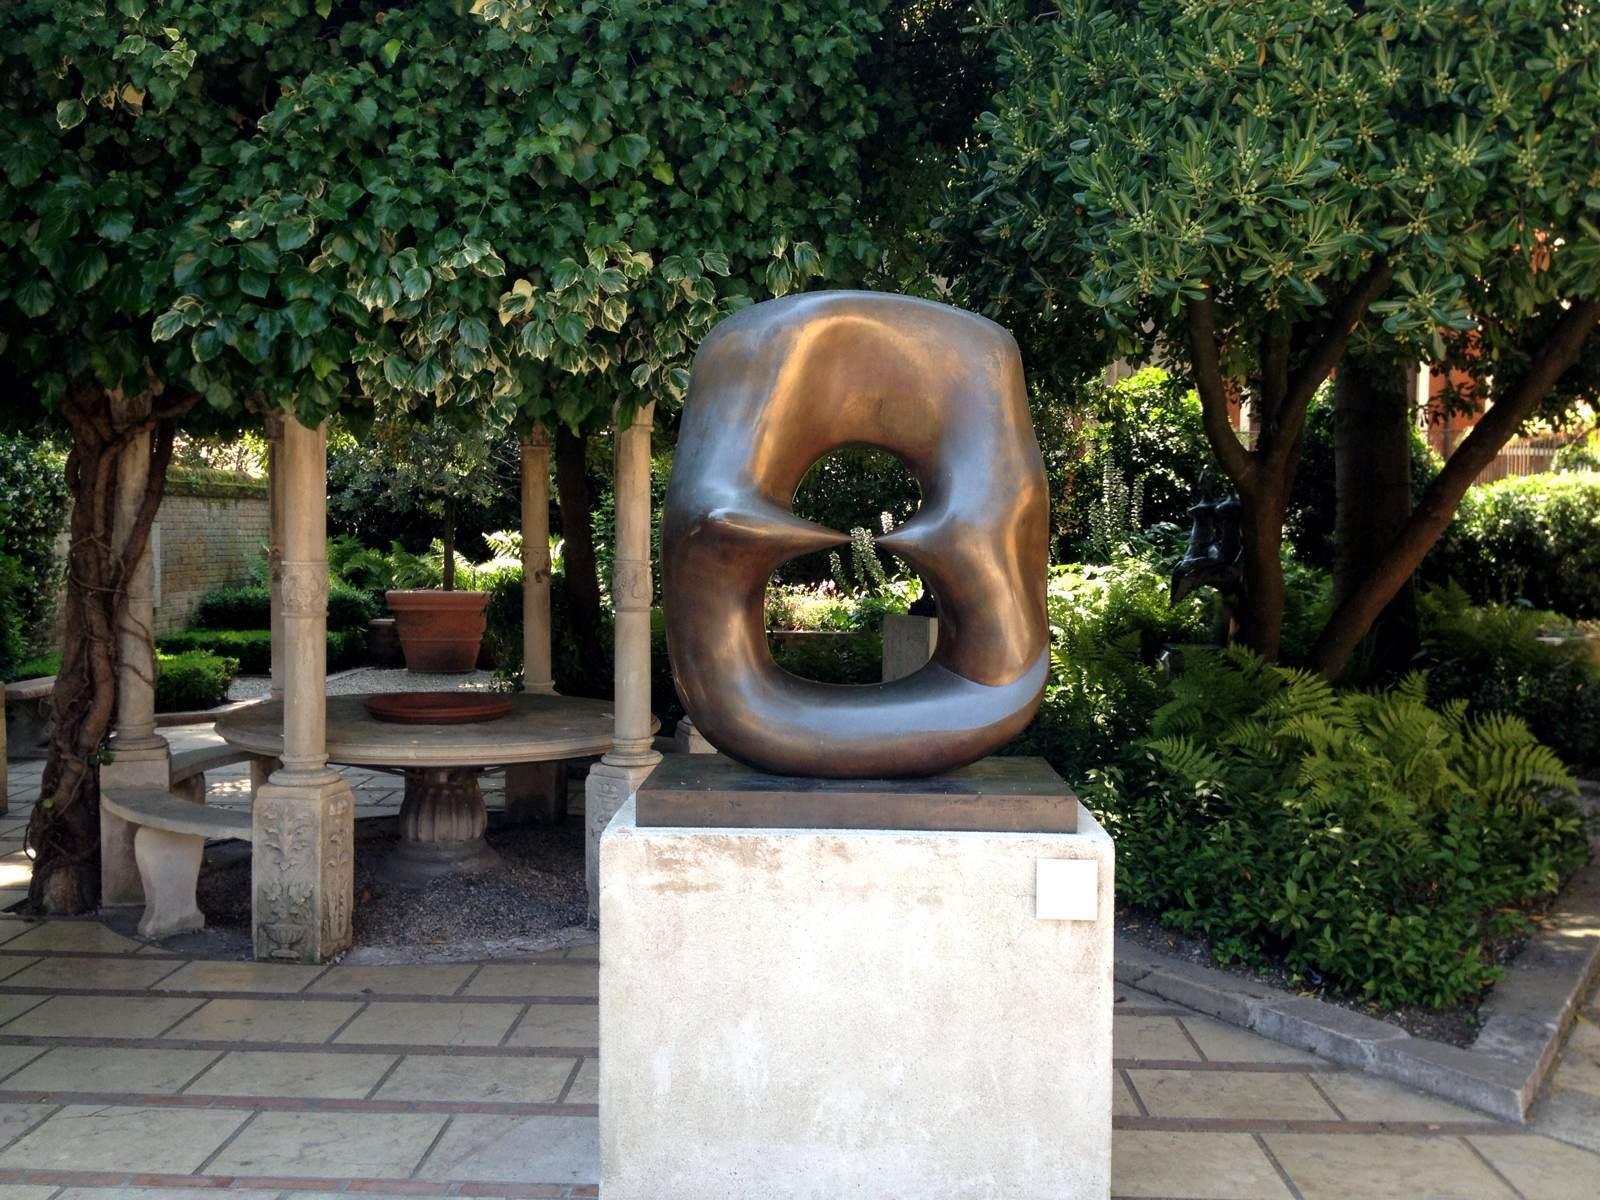 佩姬·古根汉美术馆  Peggy Guggenheim Collection   -2